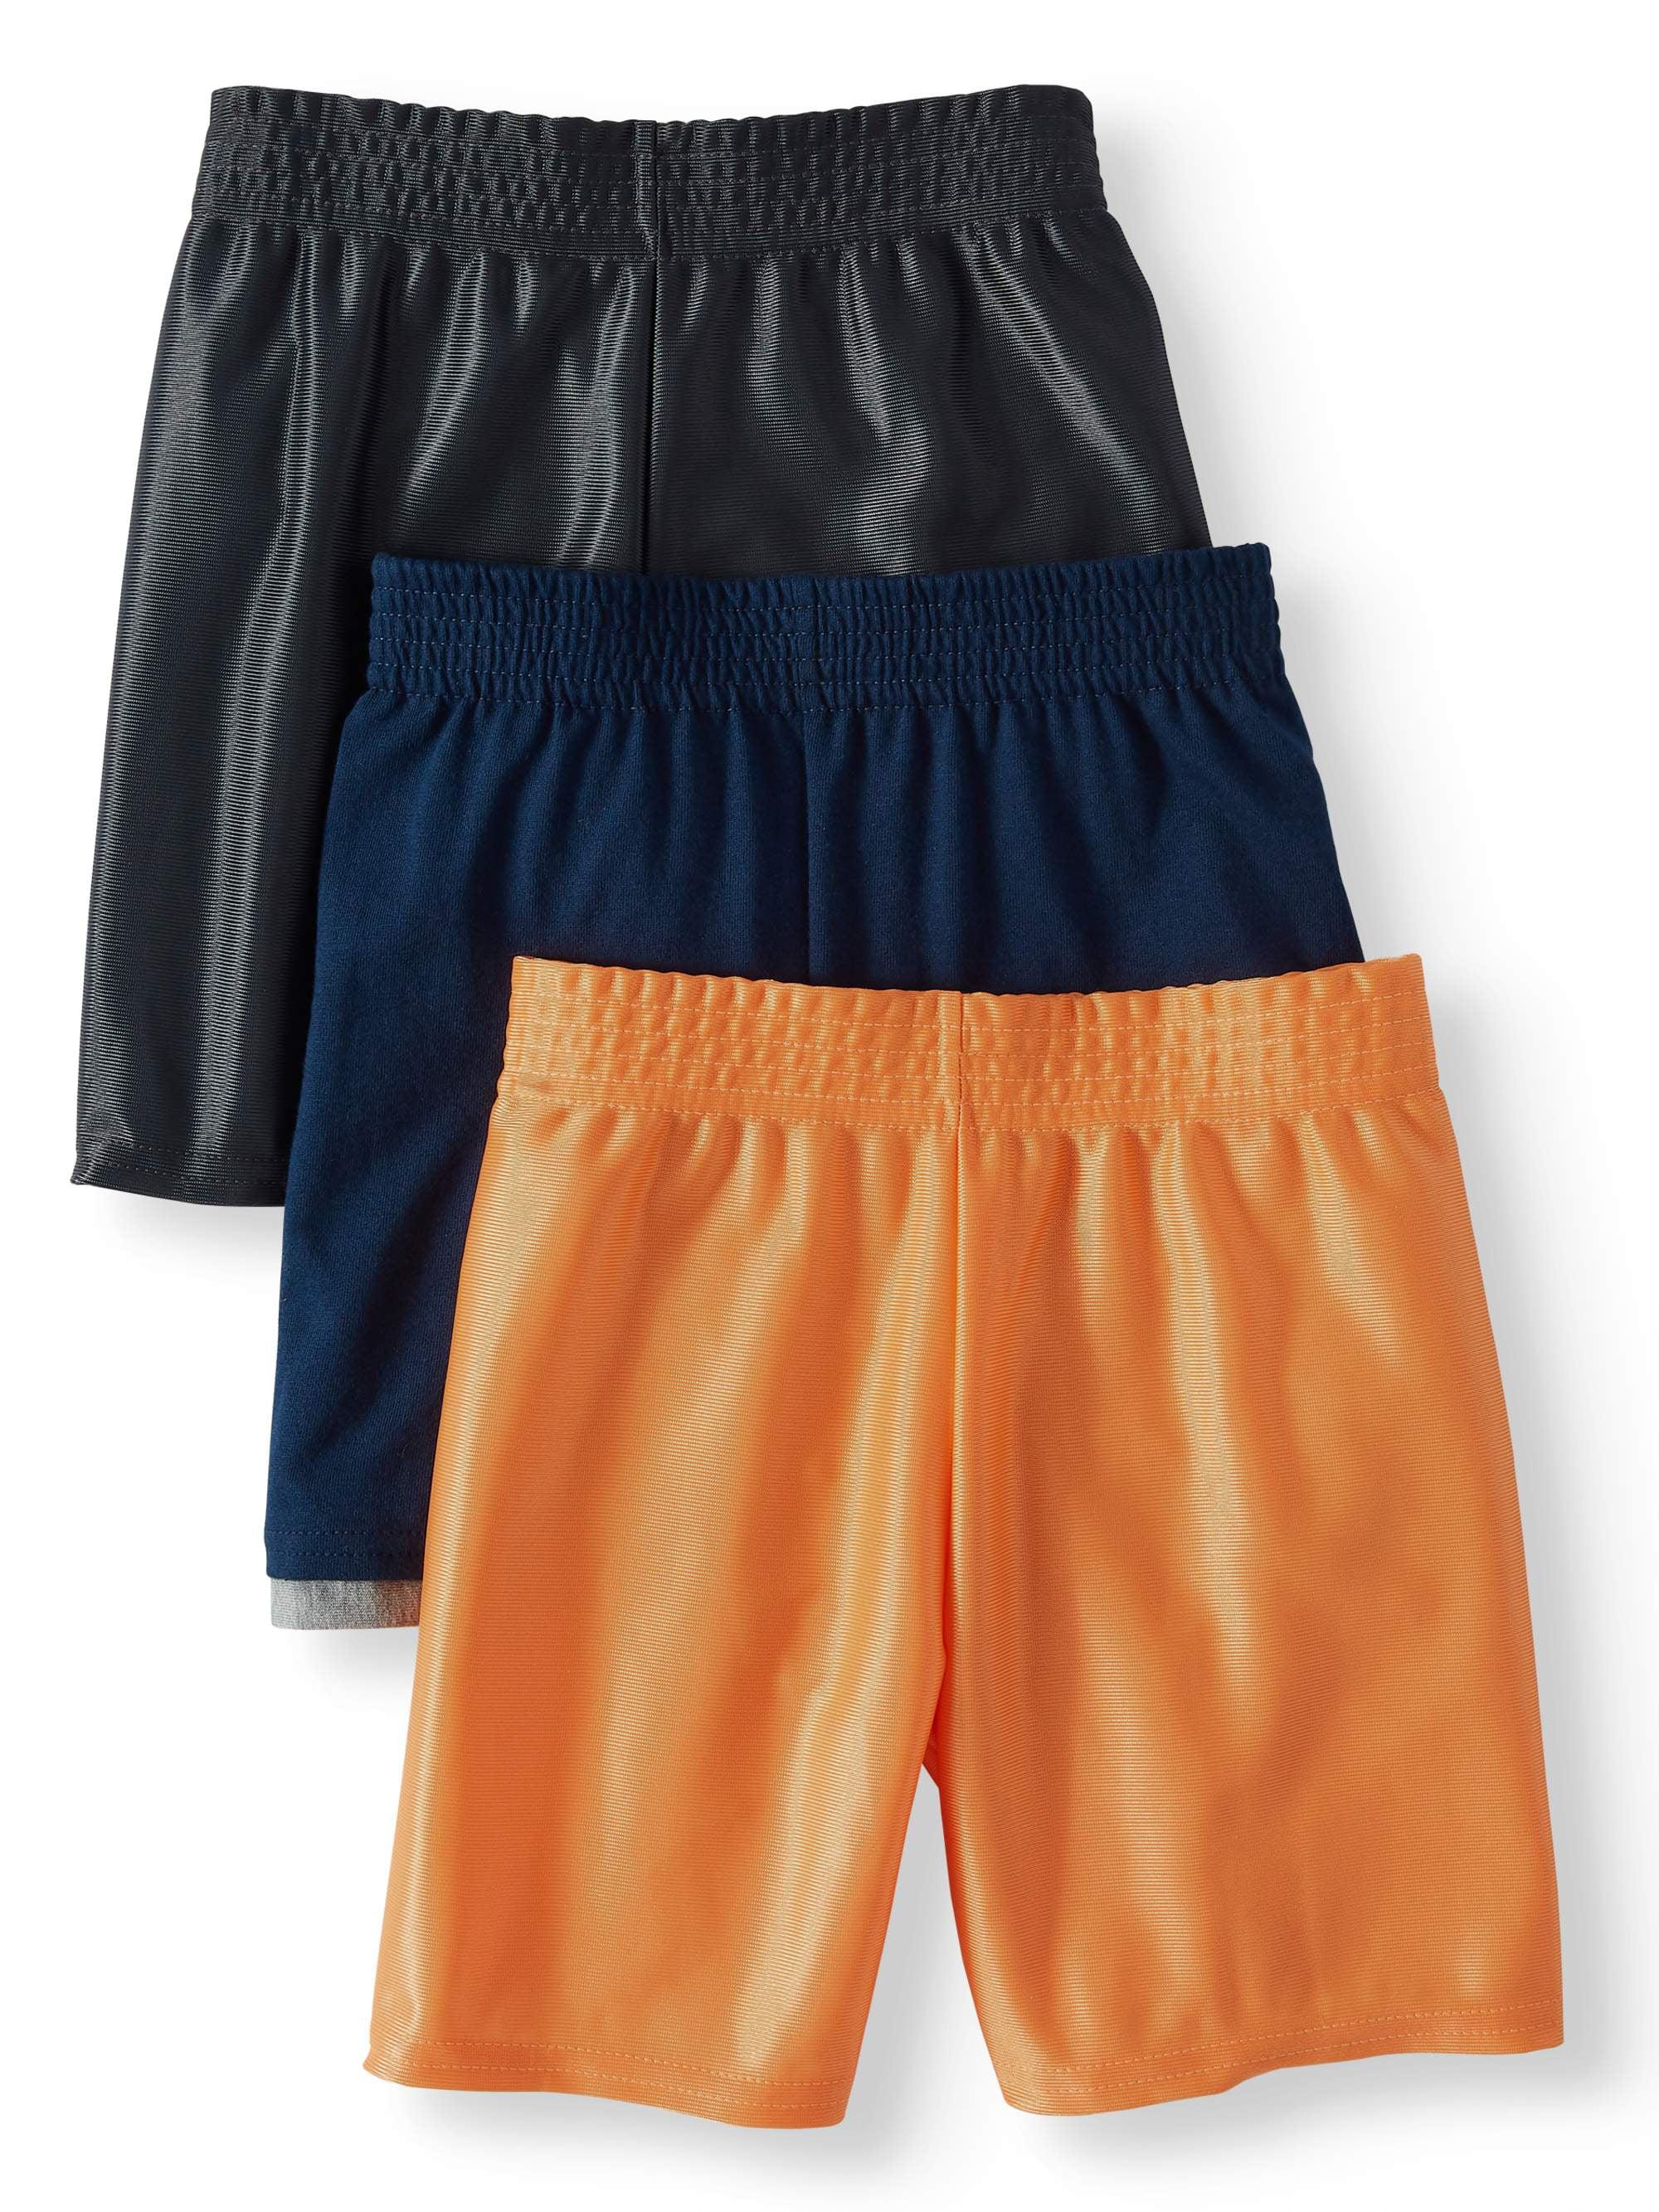 bd412d6459 Garanimals - Garanimals Dazzle & Jersey Hangdown Athletic Shorts, 3pc  Multi-Pack (Toddler Boys) - Walmart.com